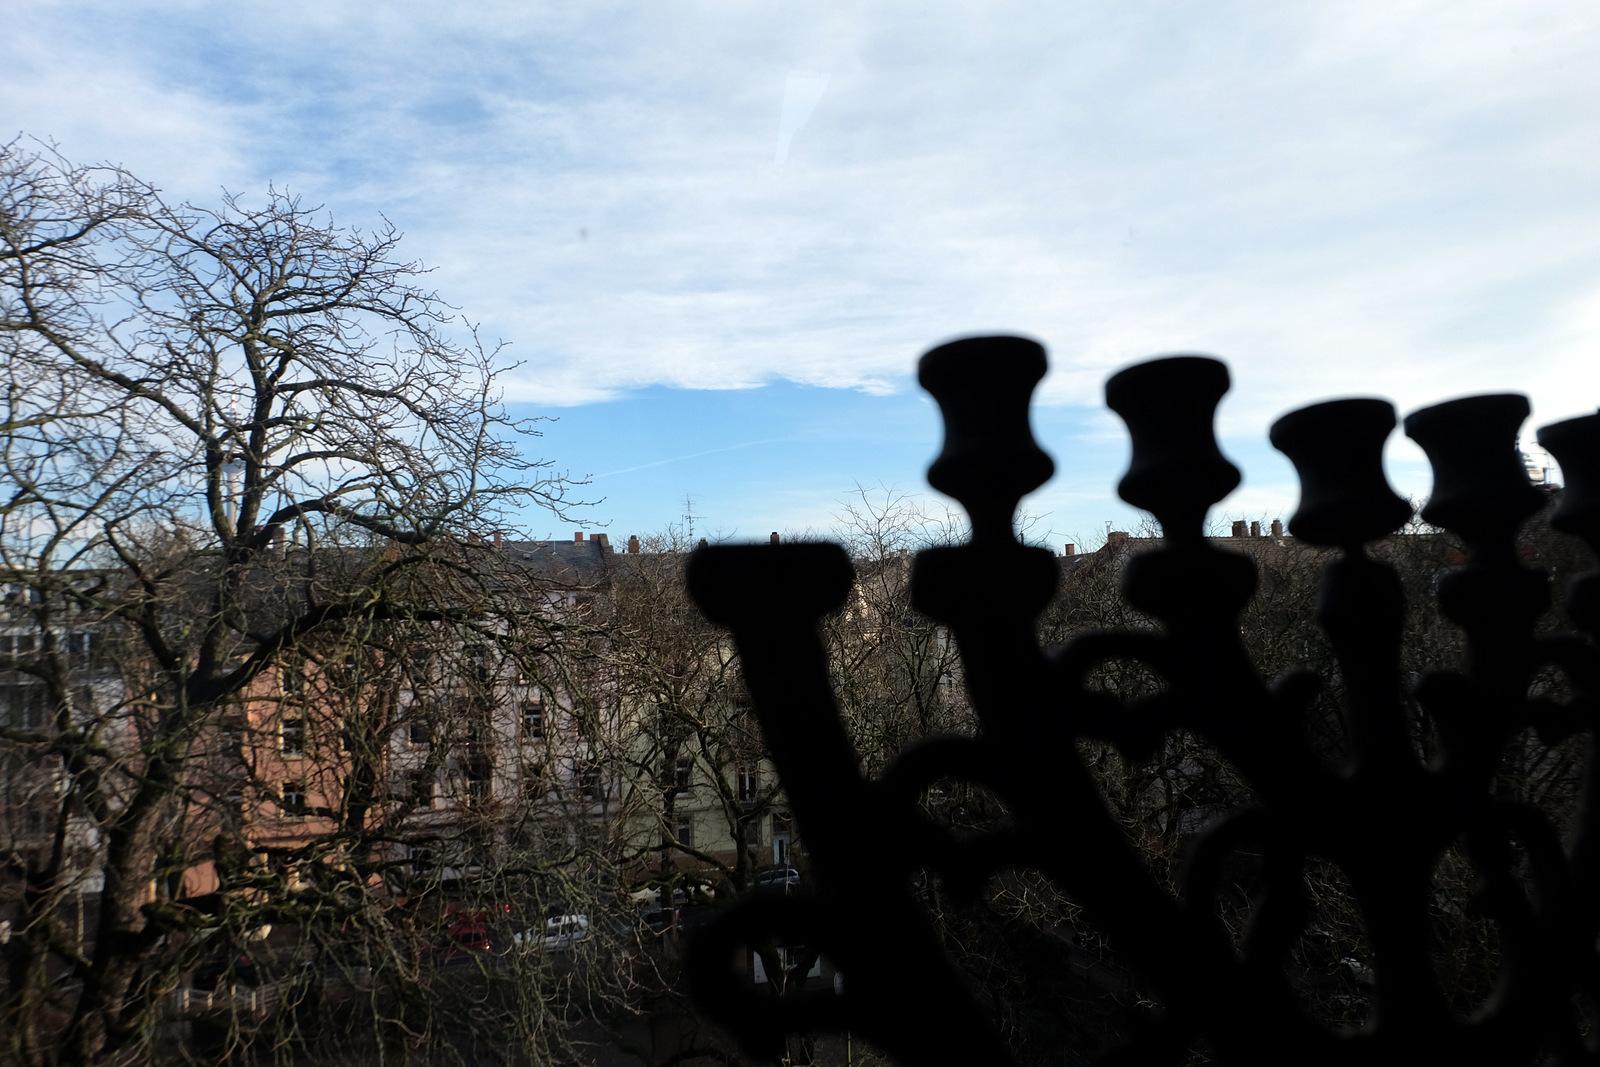 dscf1520 Roof apartment %Bockenheim